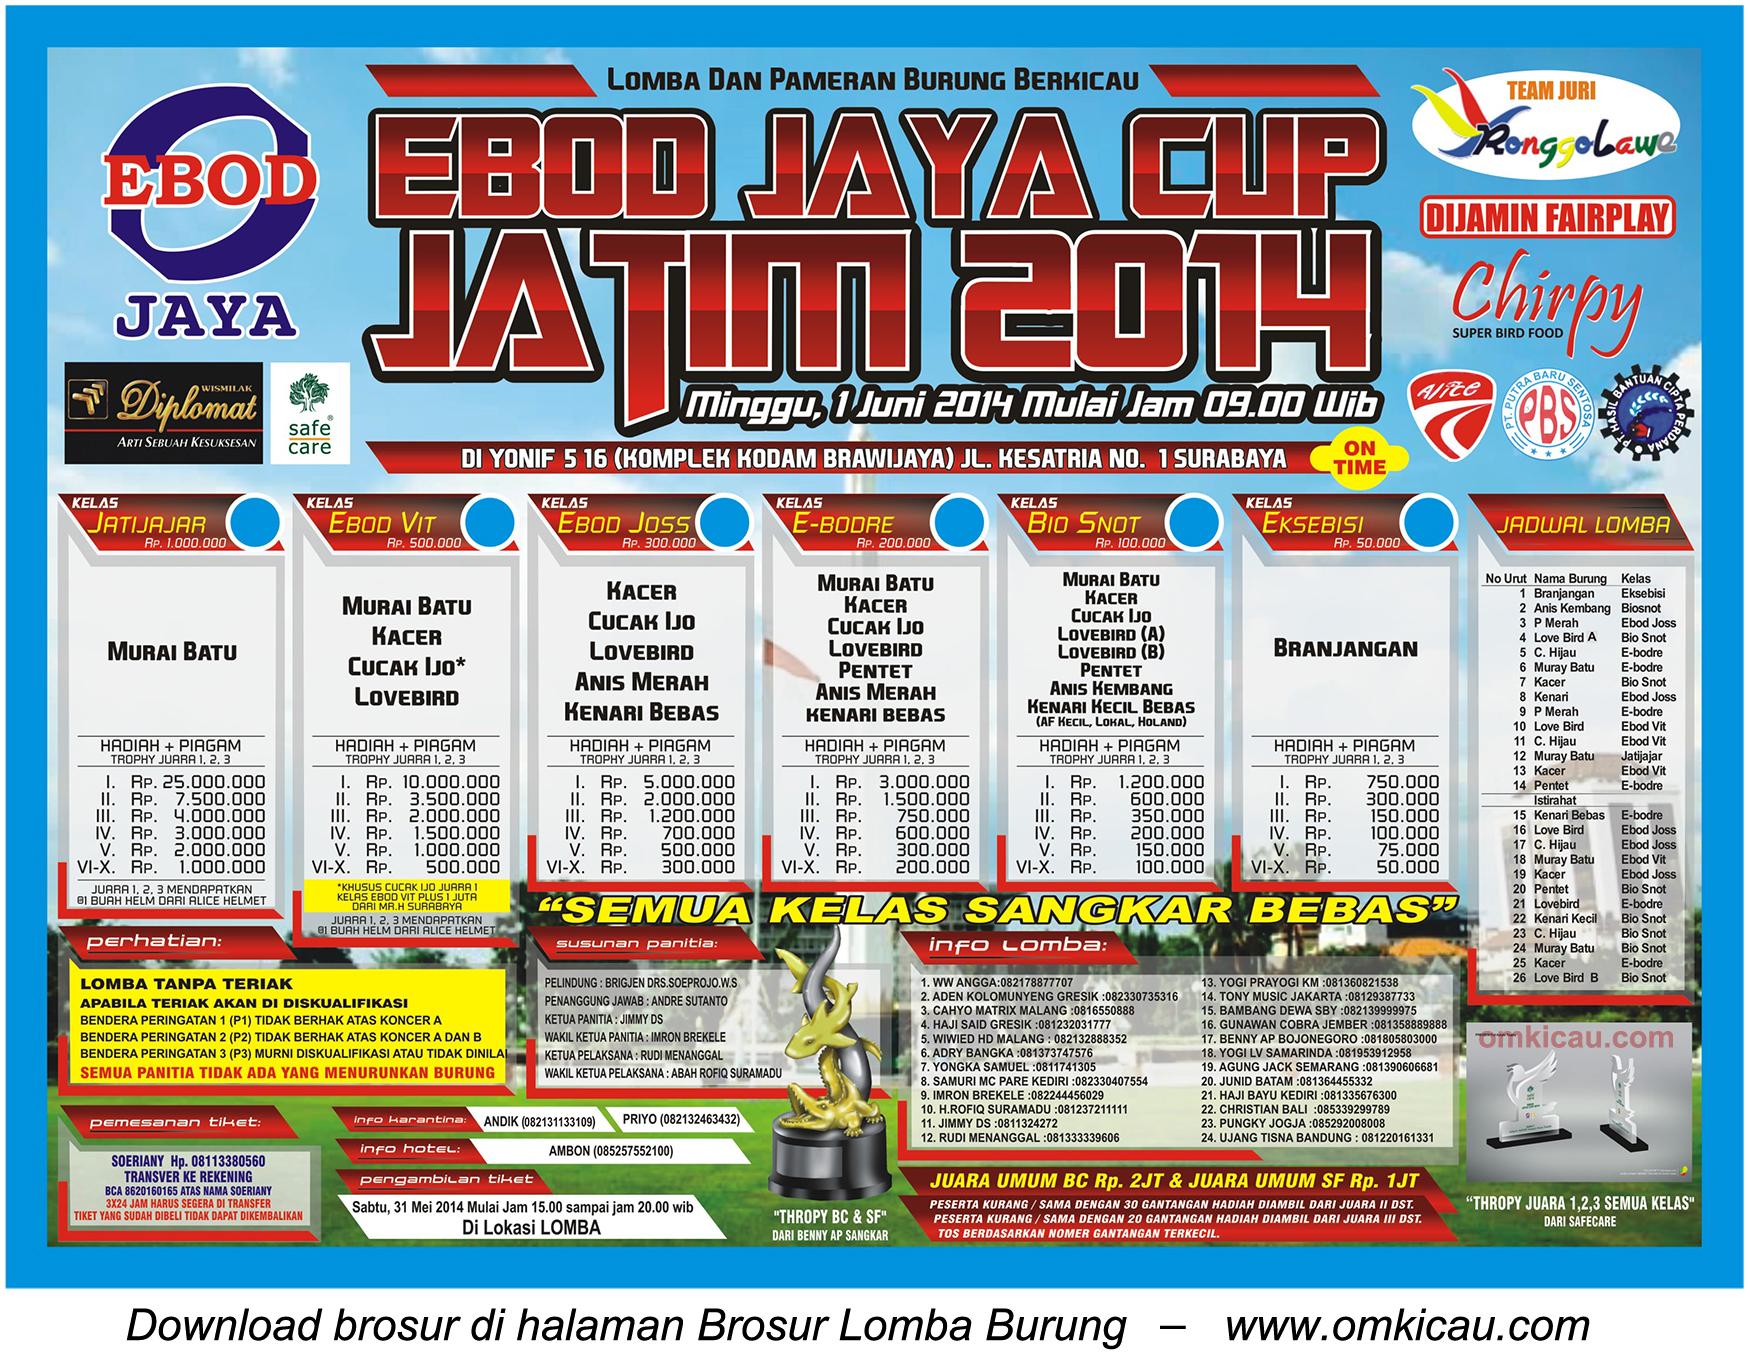 Brosur Ebod Jaya Cup 2014, Surabaya, 1 Juni 2014